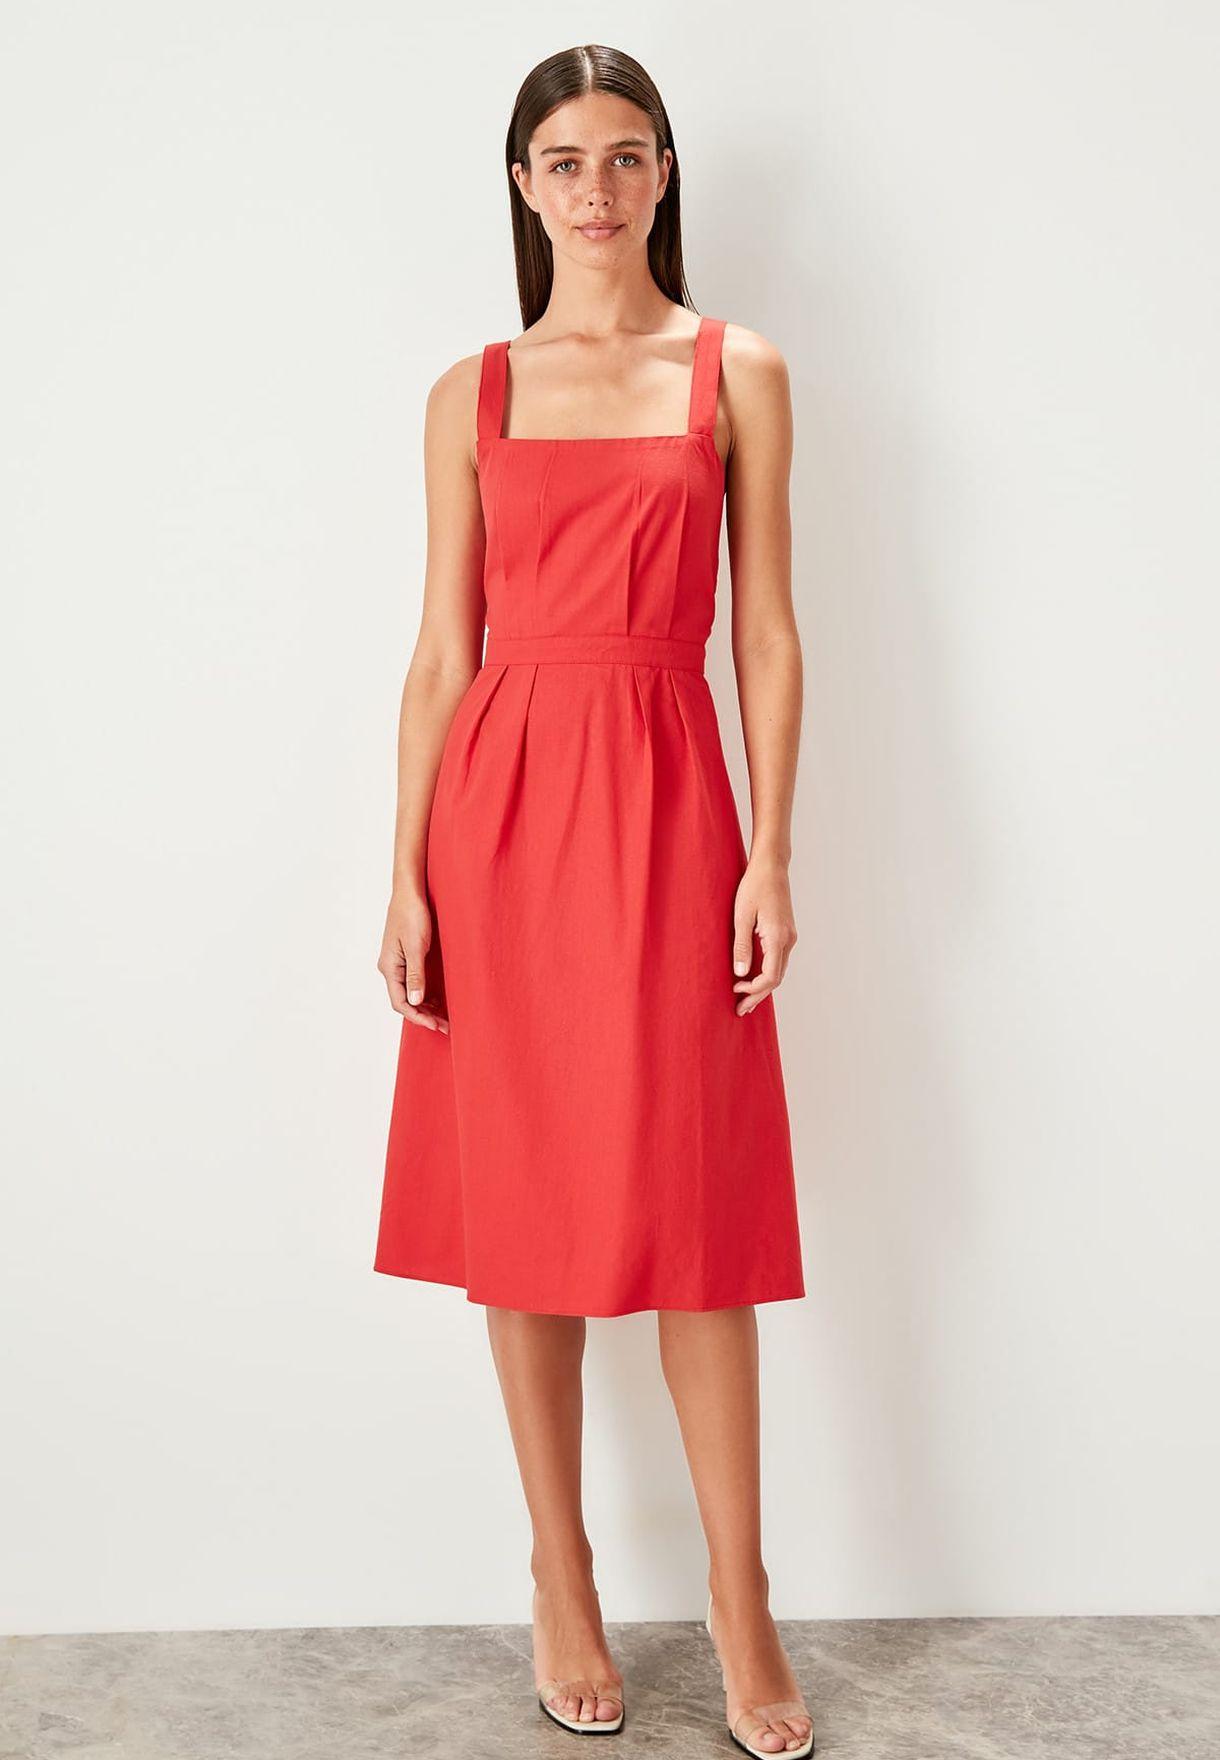 Square Neck Pleated Trim Dress